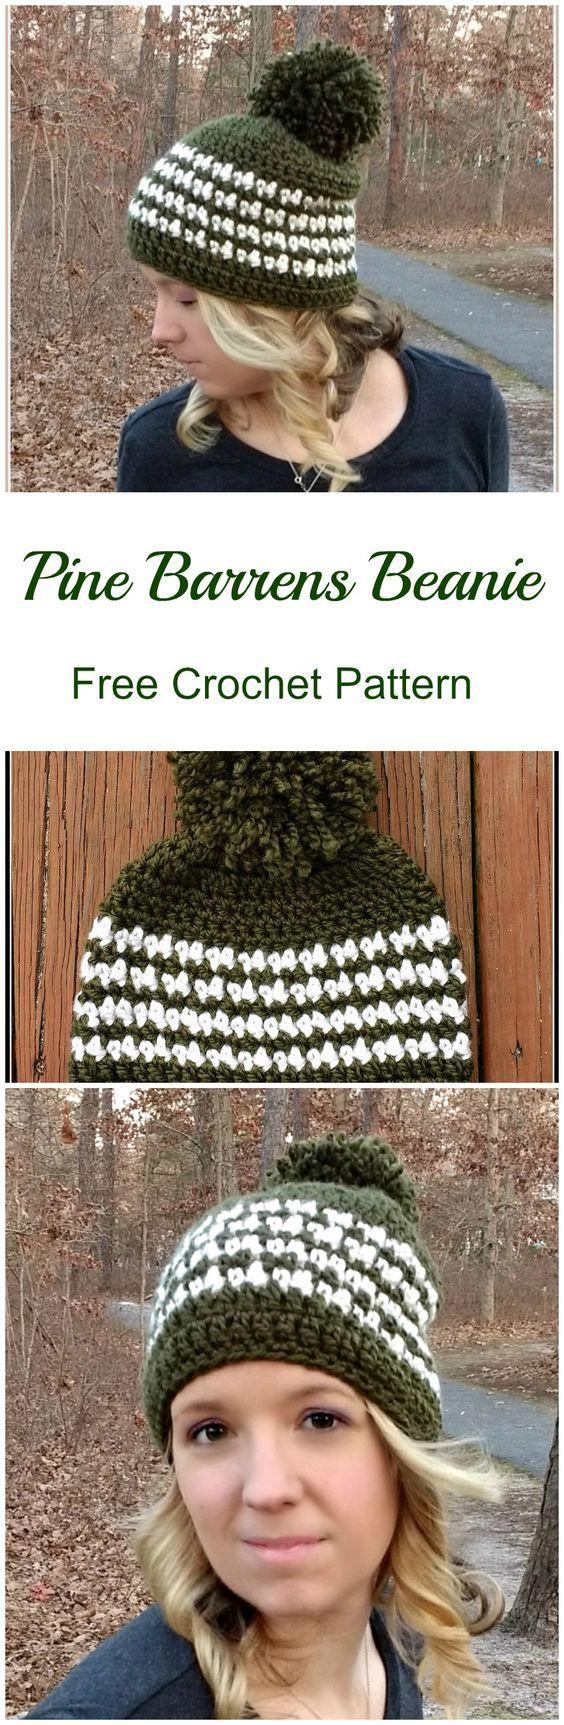 My Hobby Is Crochet: Pine Barrens Beanie Crochet Pattern